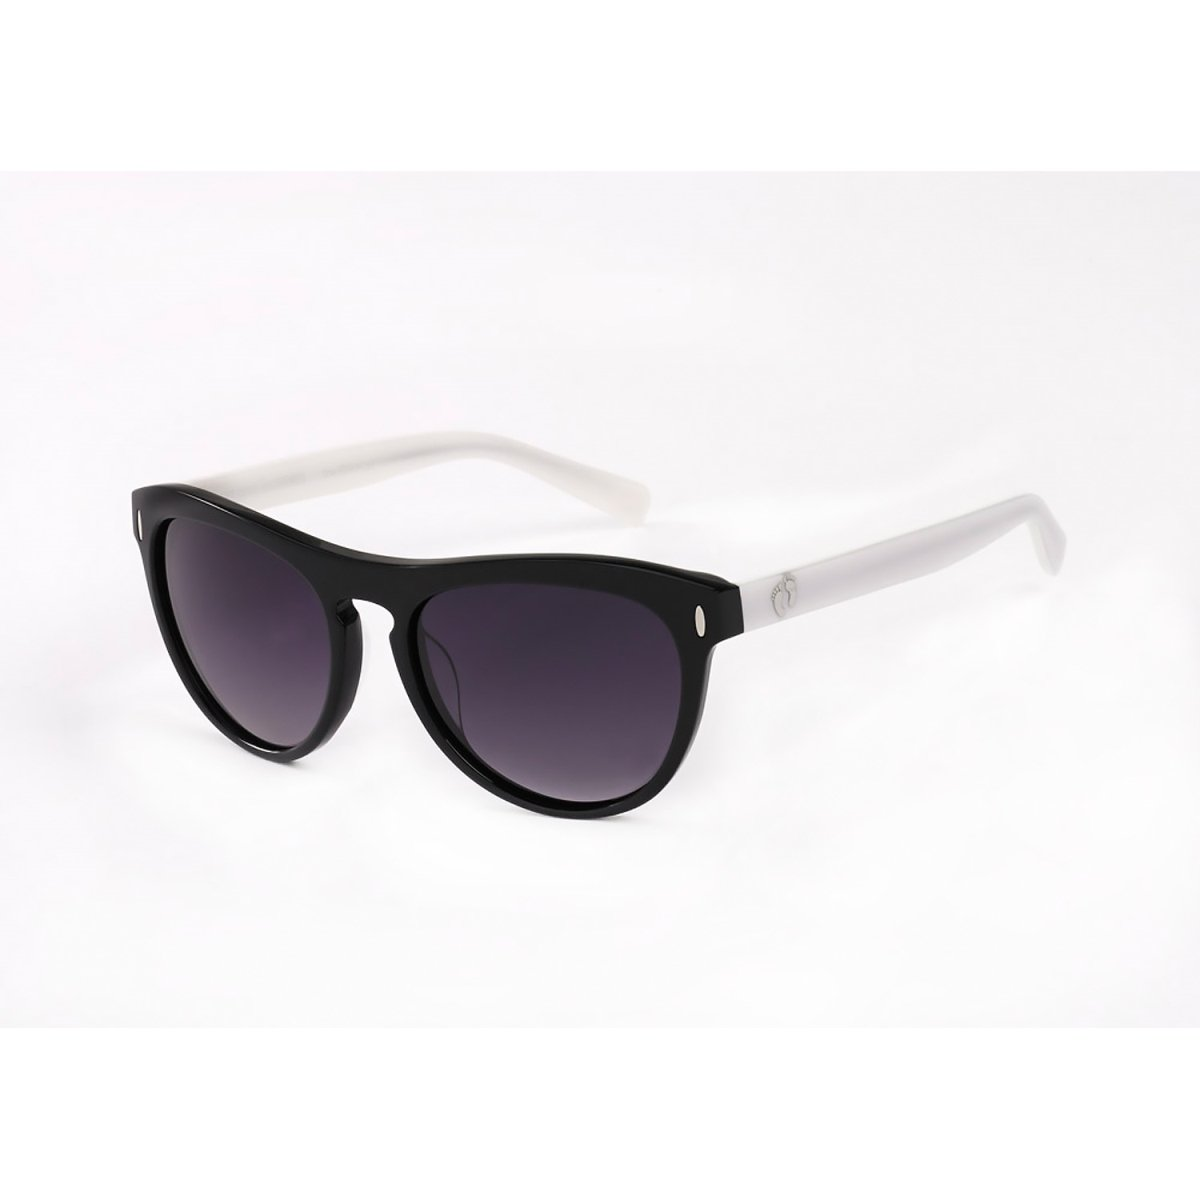 Hang Ten Gold The Beach Ley-Shiny Black-White/Smoke Lens